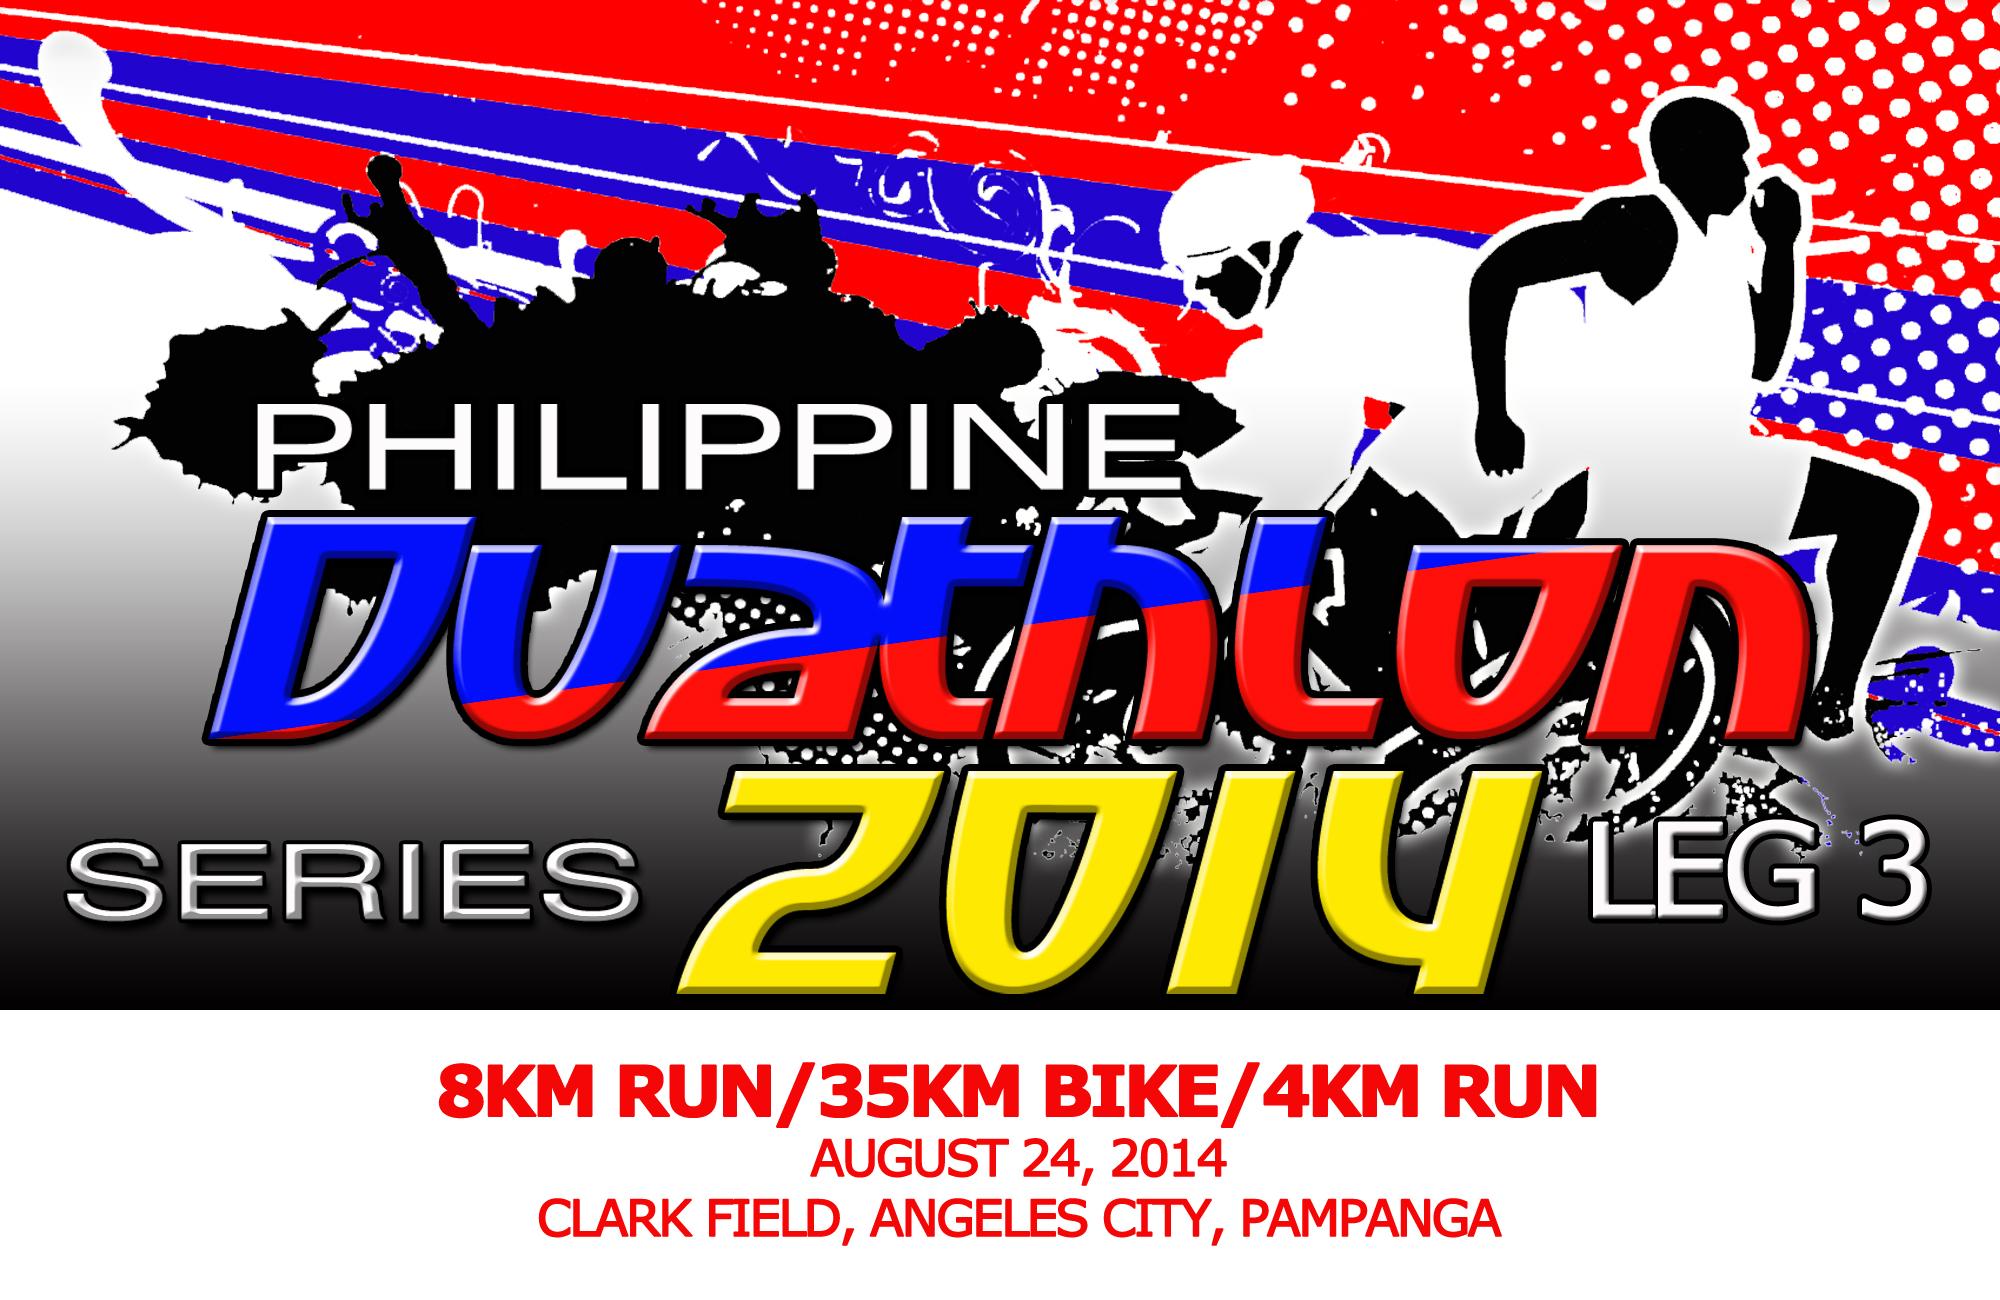 philippine-duathlon-series-leg3-2014-poster